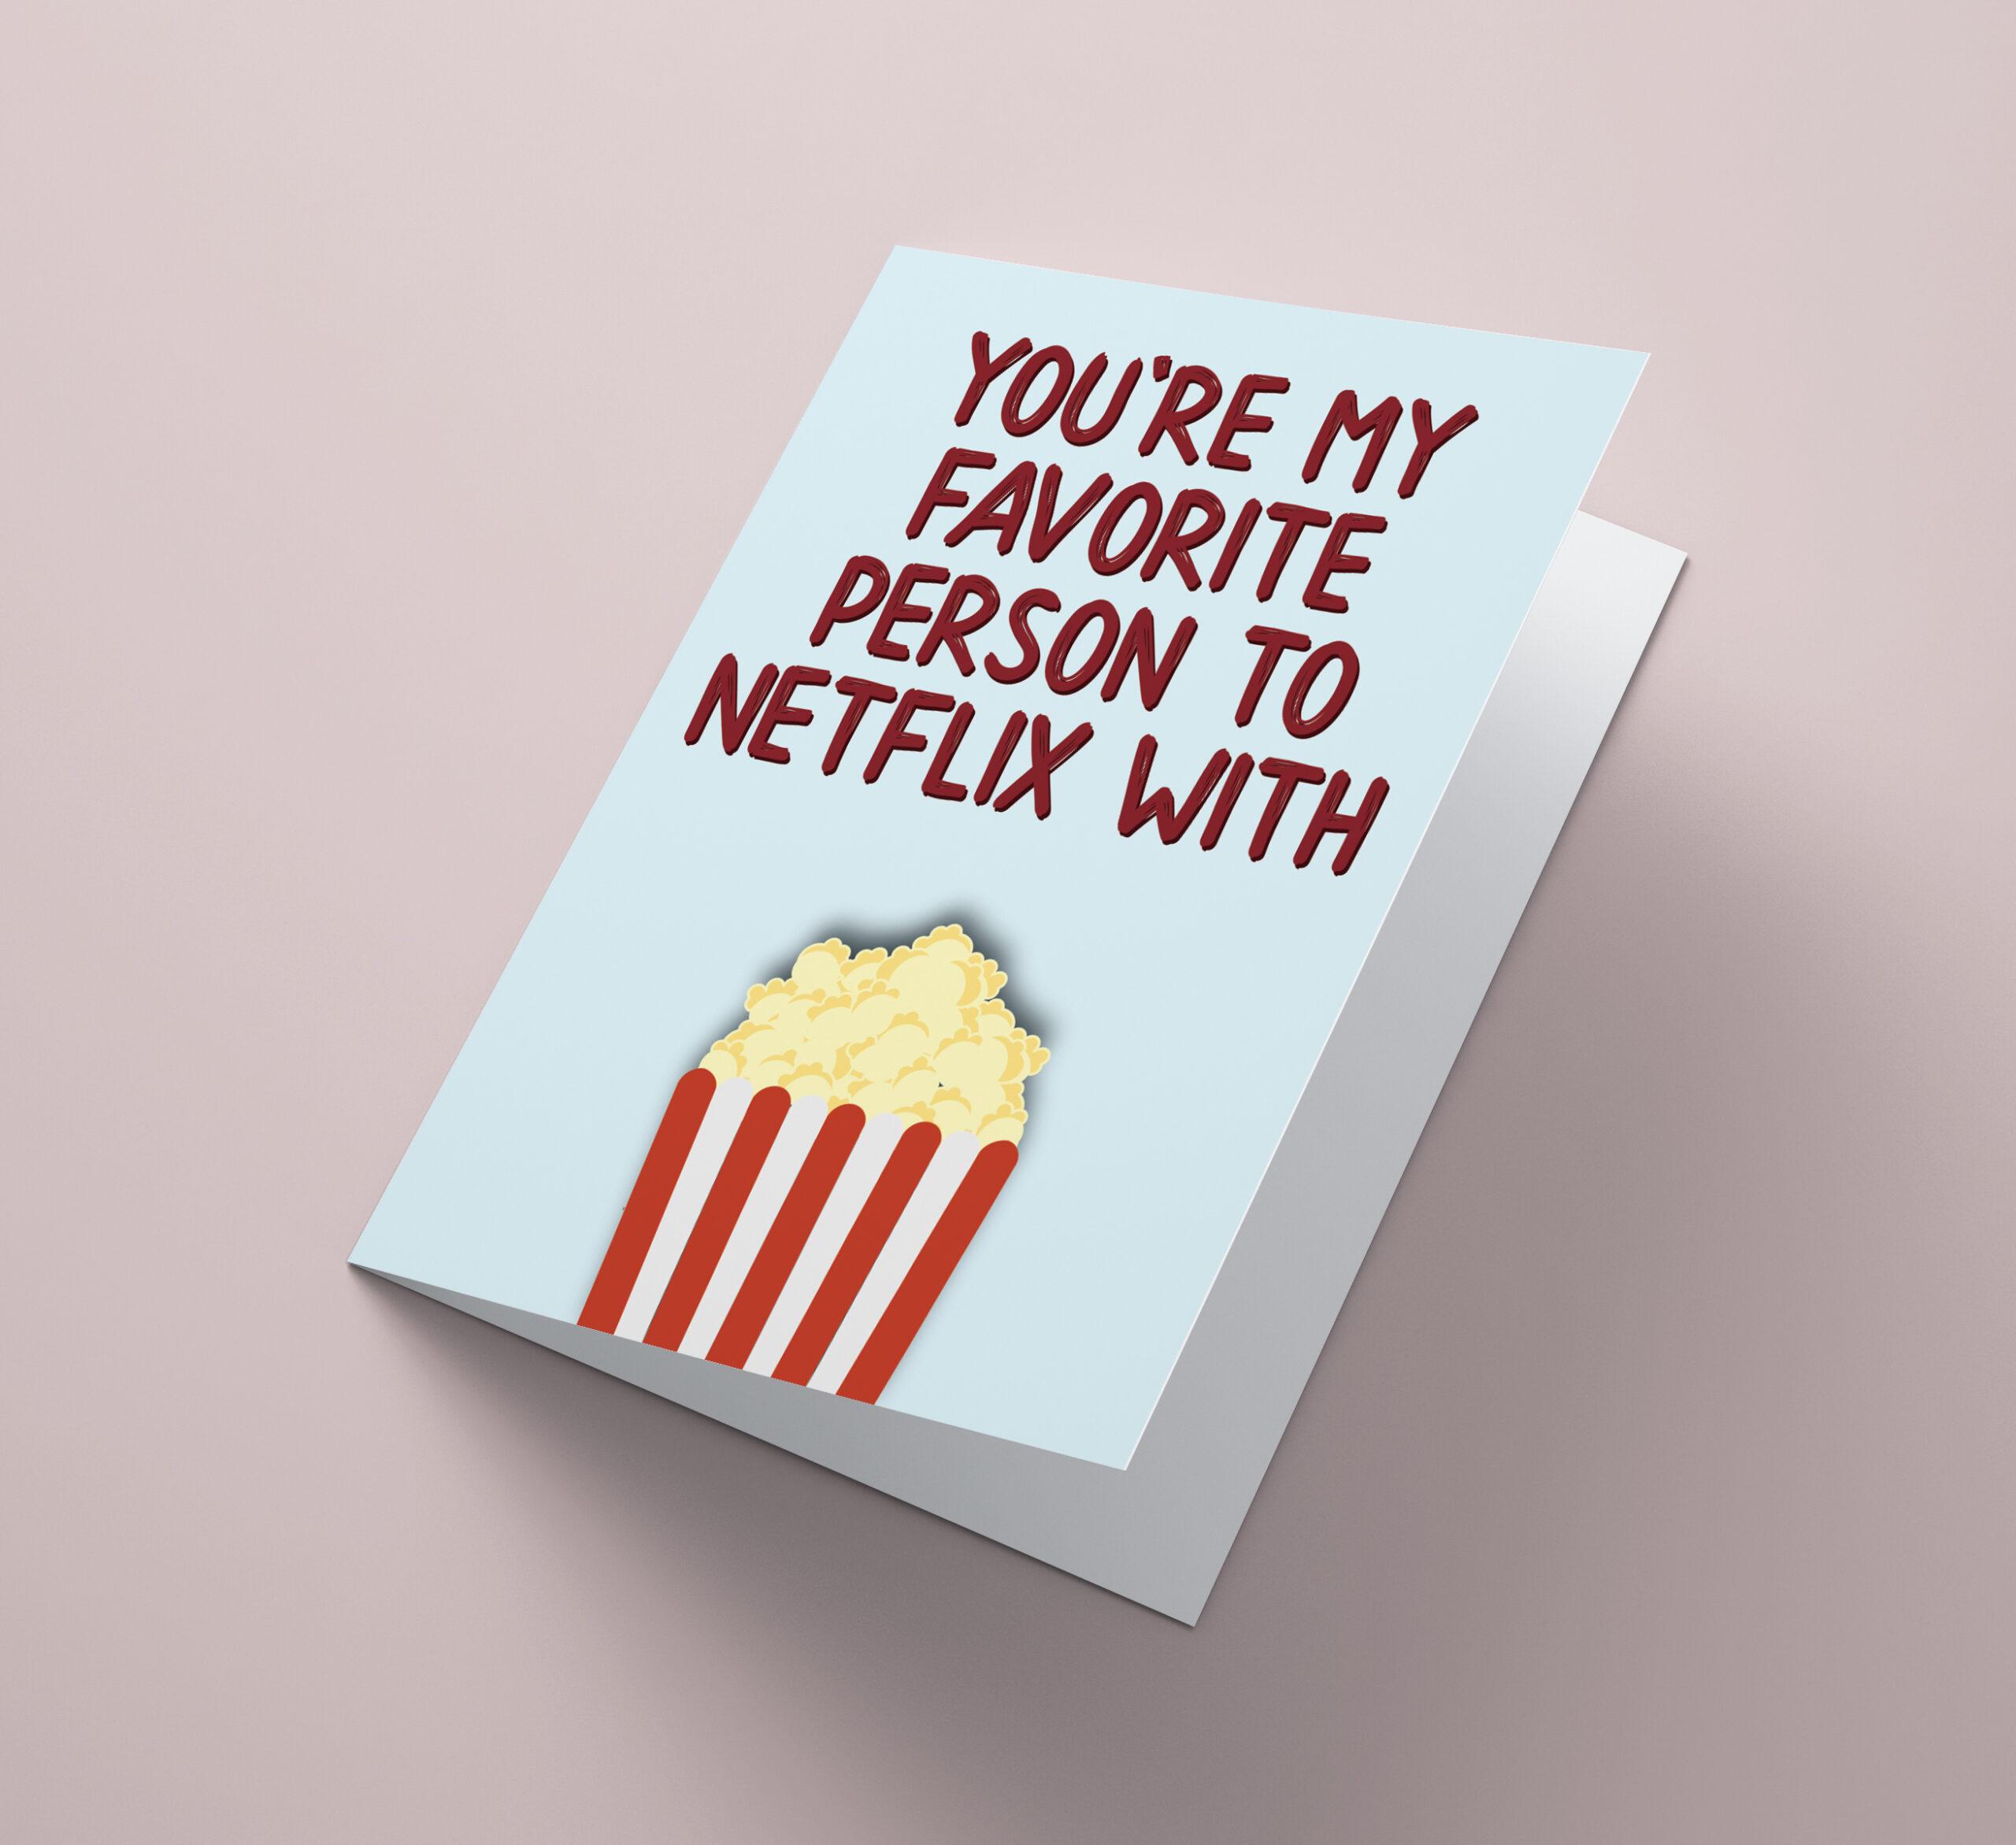 Favorite Netflix person